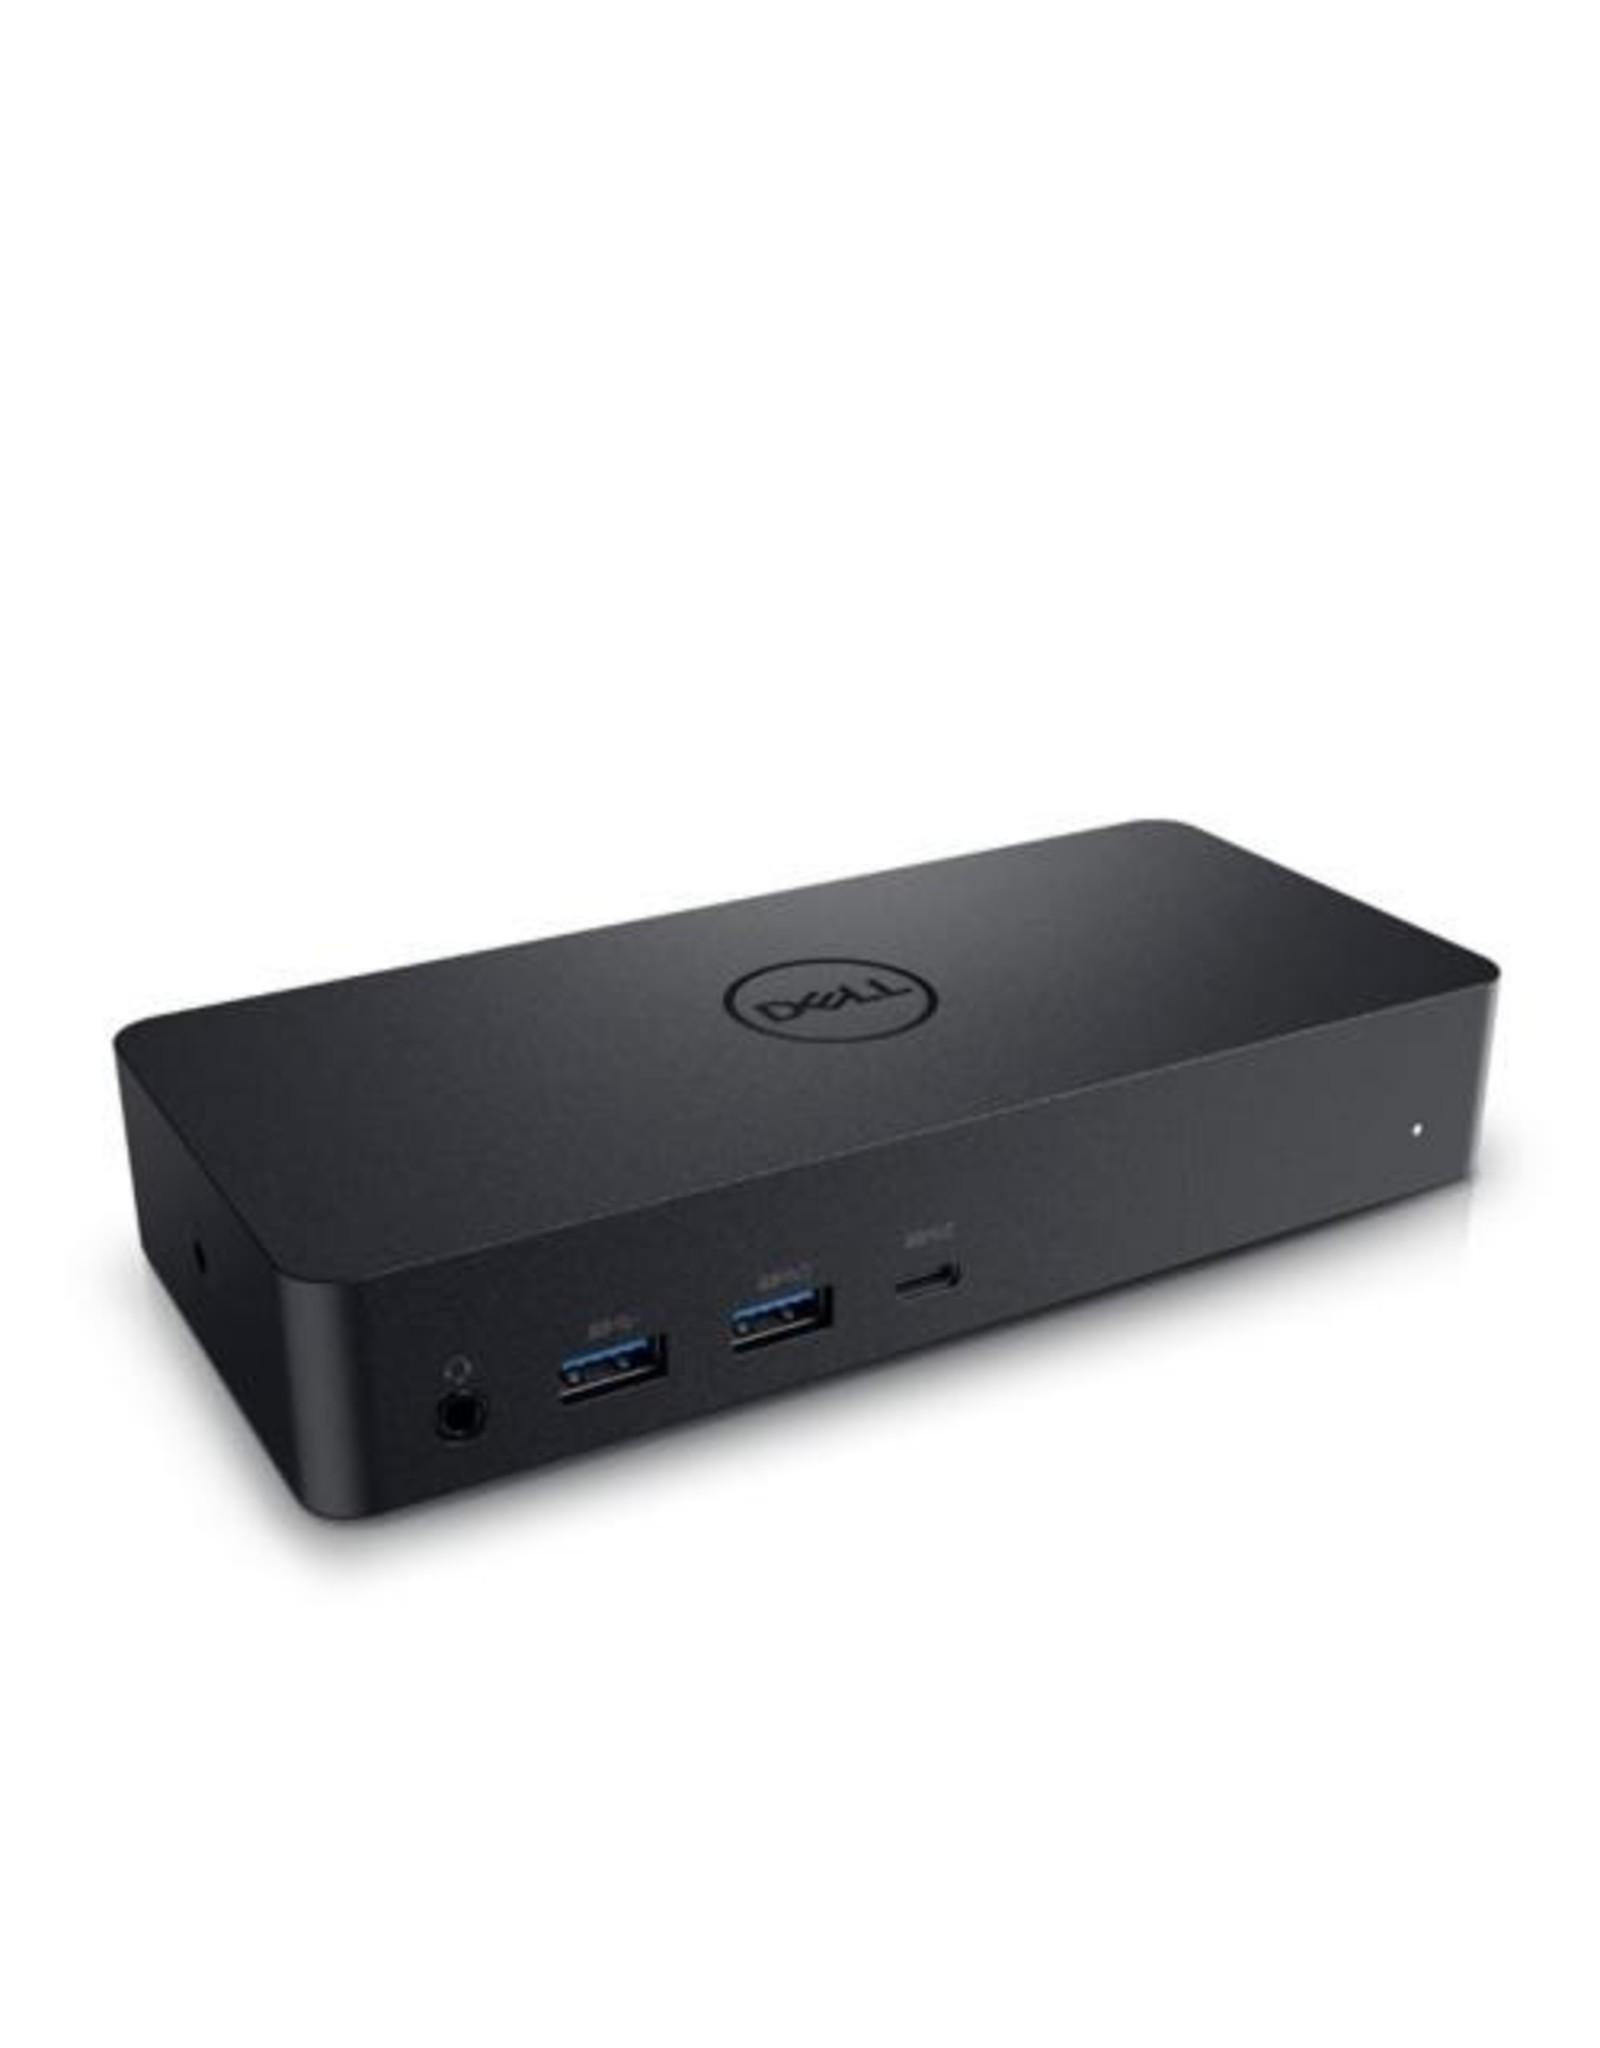 Dell DELL D6000 Docking Station USB 3.0 (3.1 Gen 1) Type-C Zwart